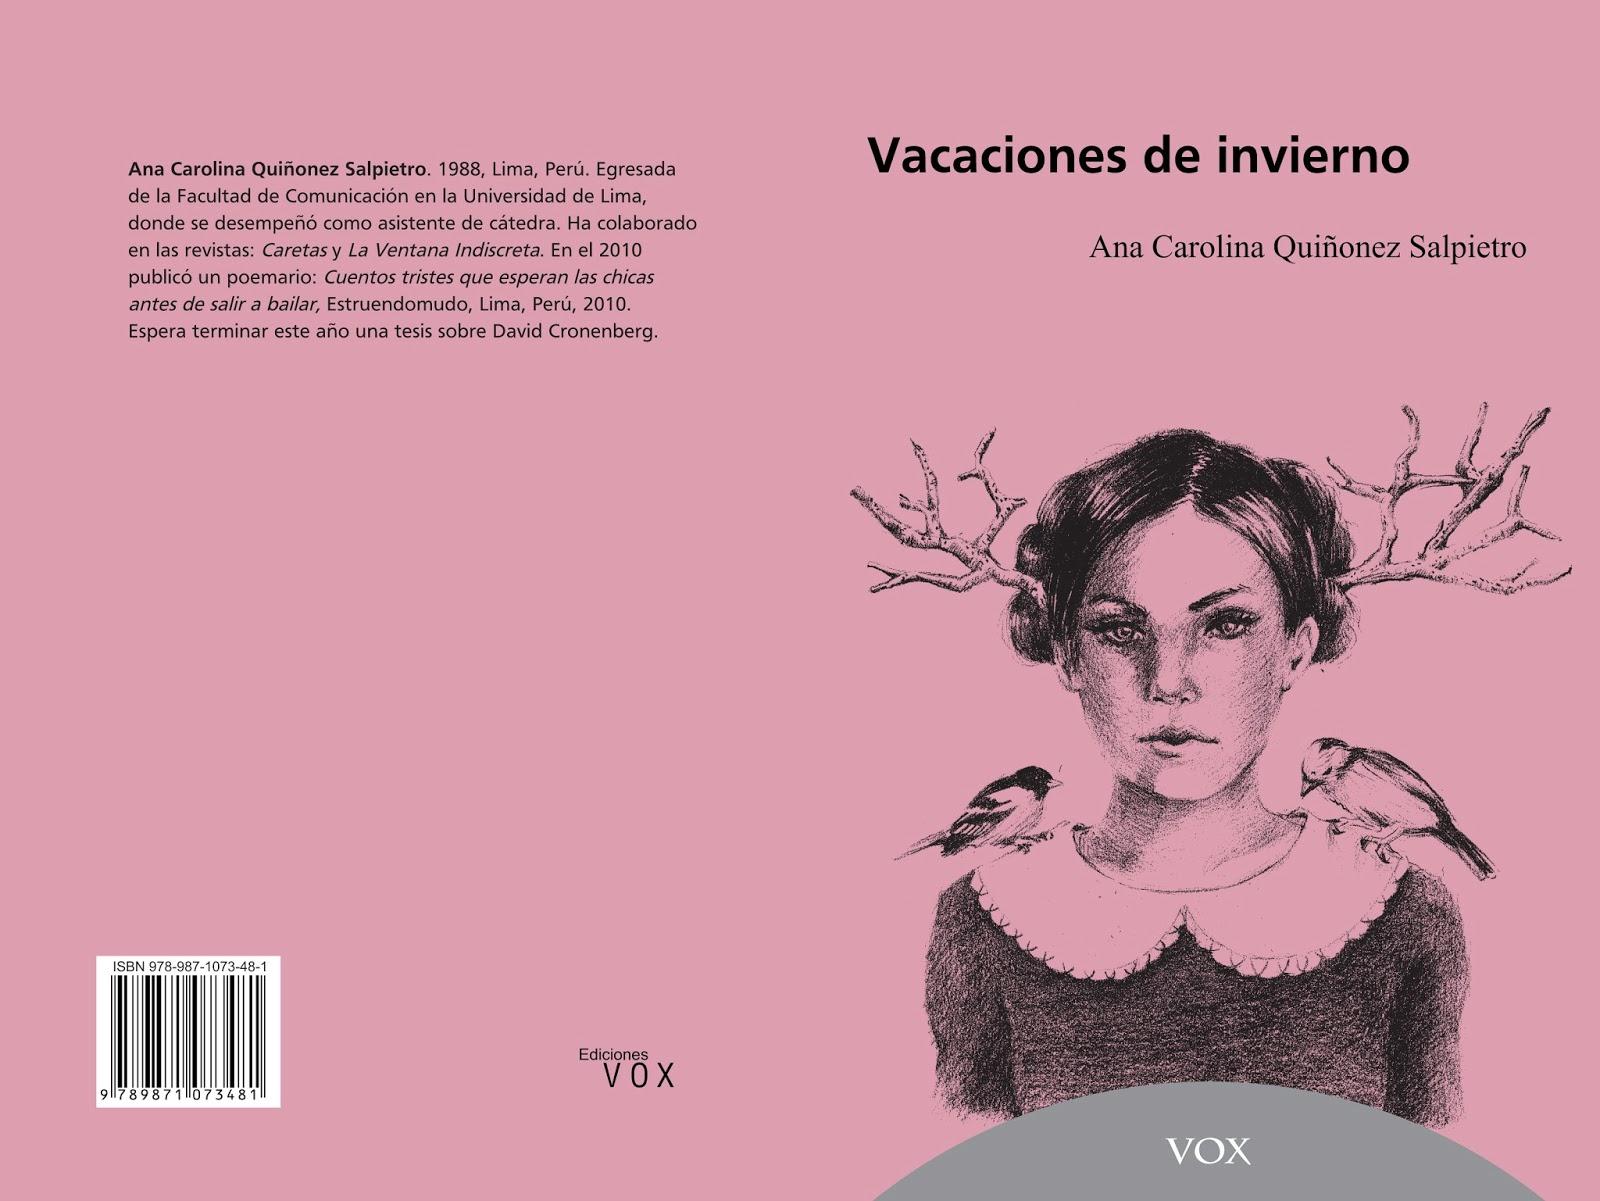 Vacaciones de invierno, Ana Carolina Quiñonez